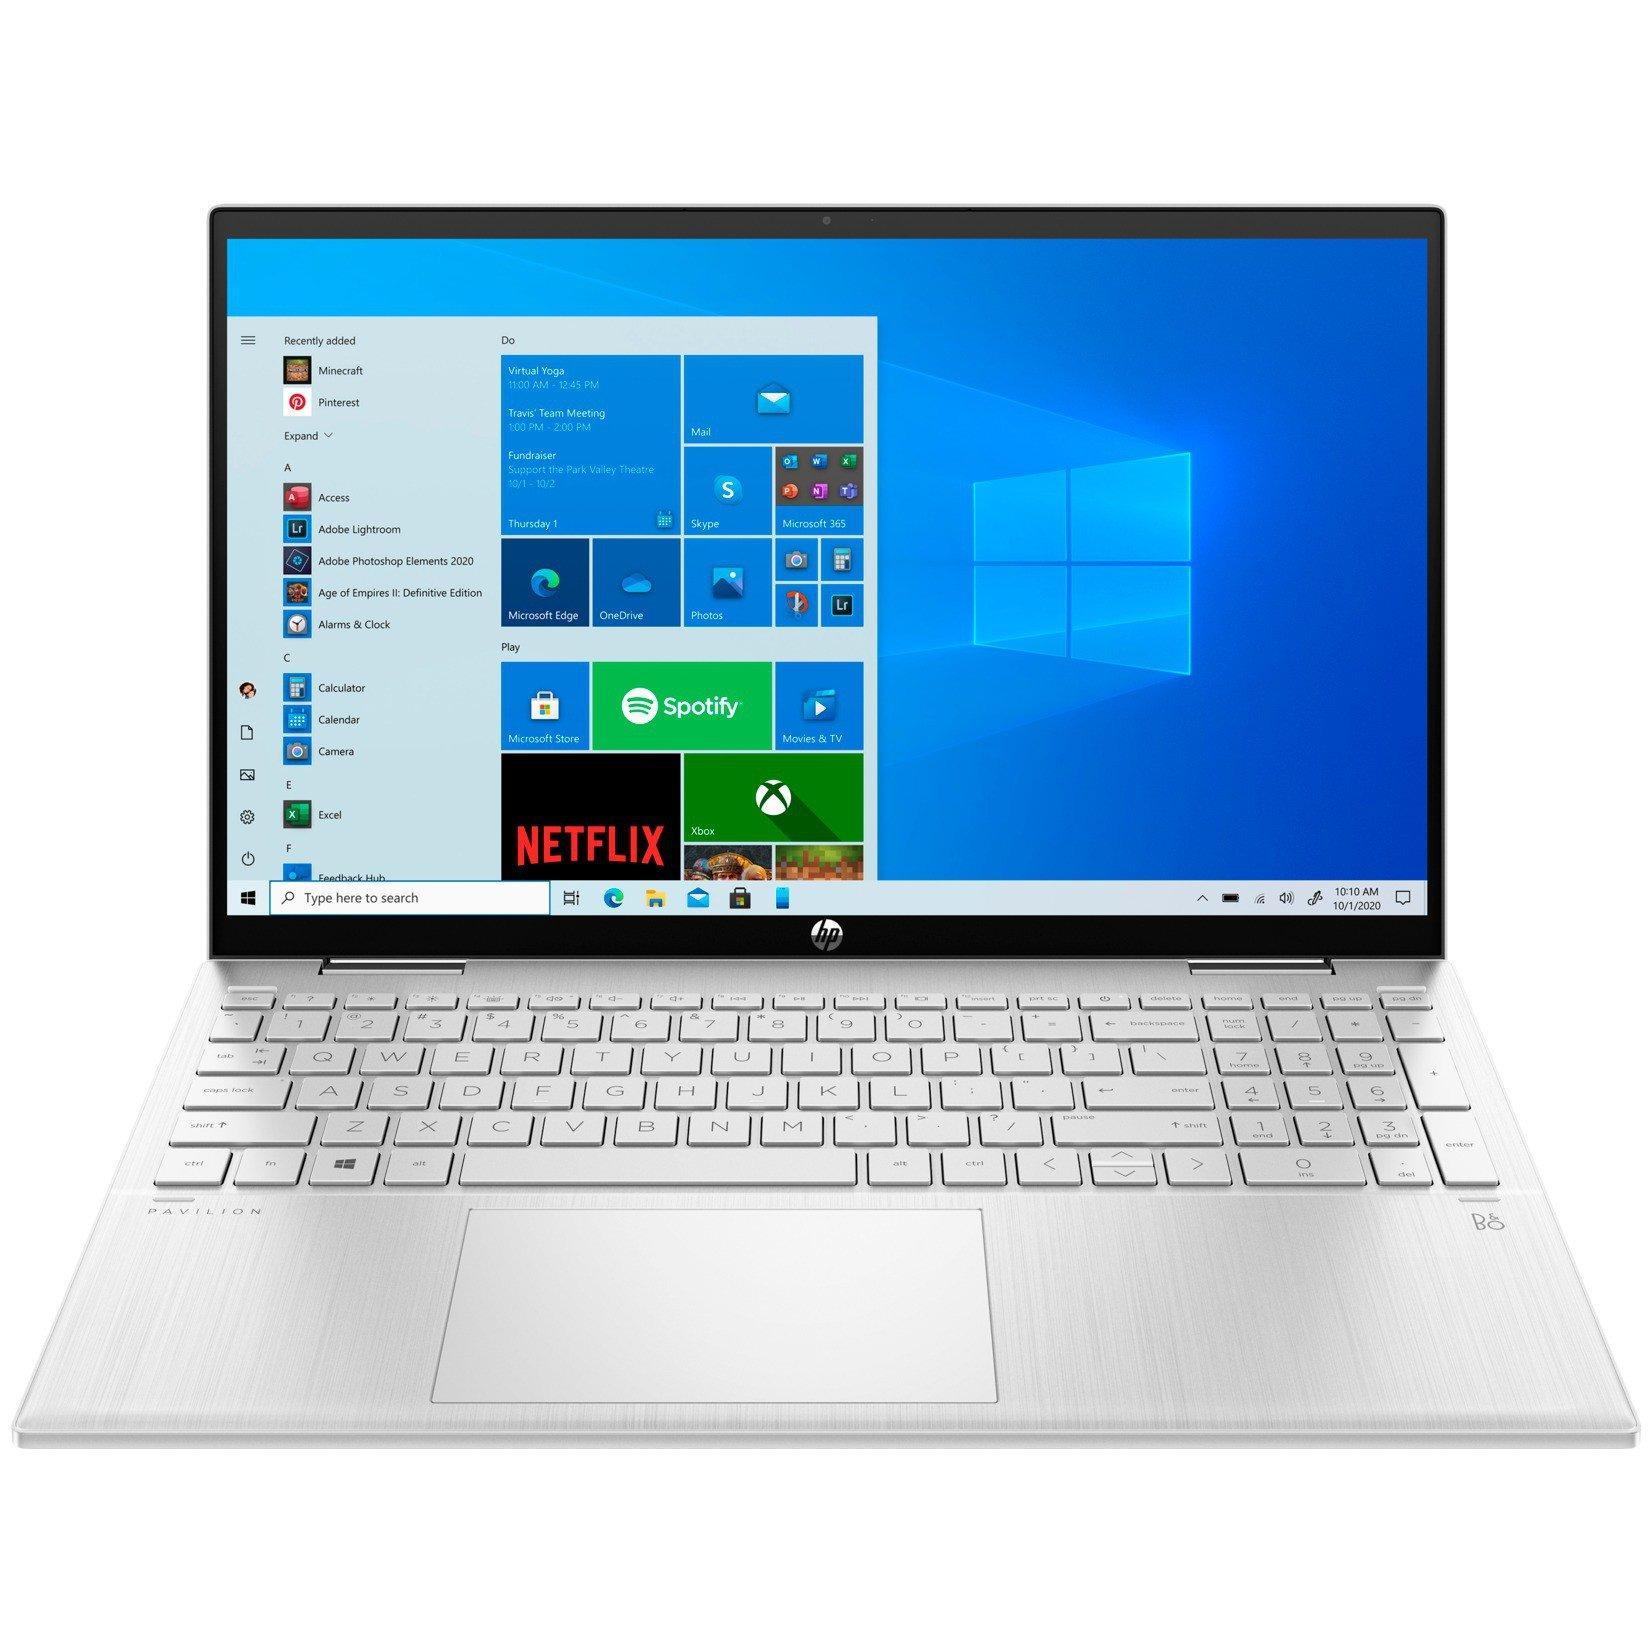 "HP PAVILION x360 15-er0002ur (Intel Core i3 1125G4 2000MHz/15.6""/1920x1080/8GB/256GB SSD/Intel UHD Graphics/Windows 10 Home)"